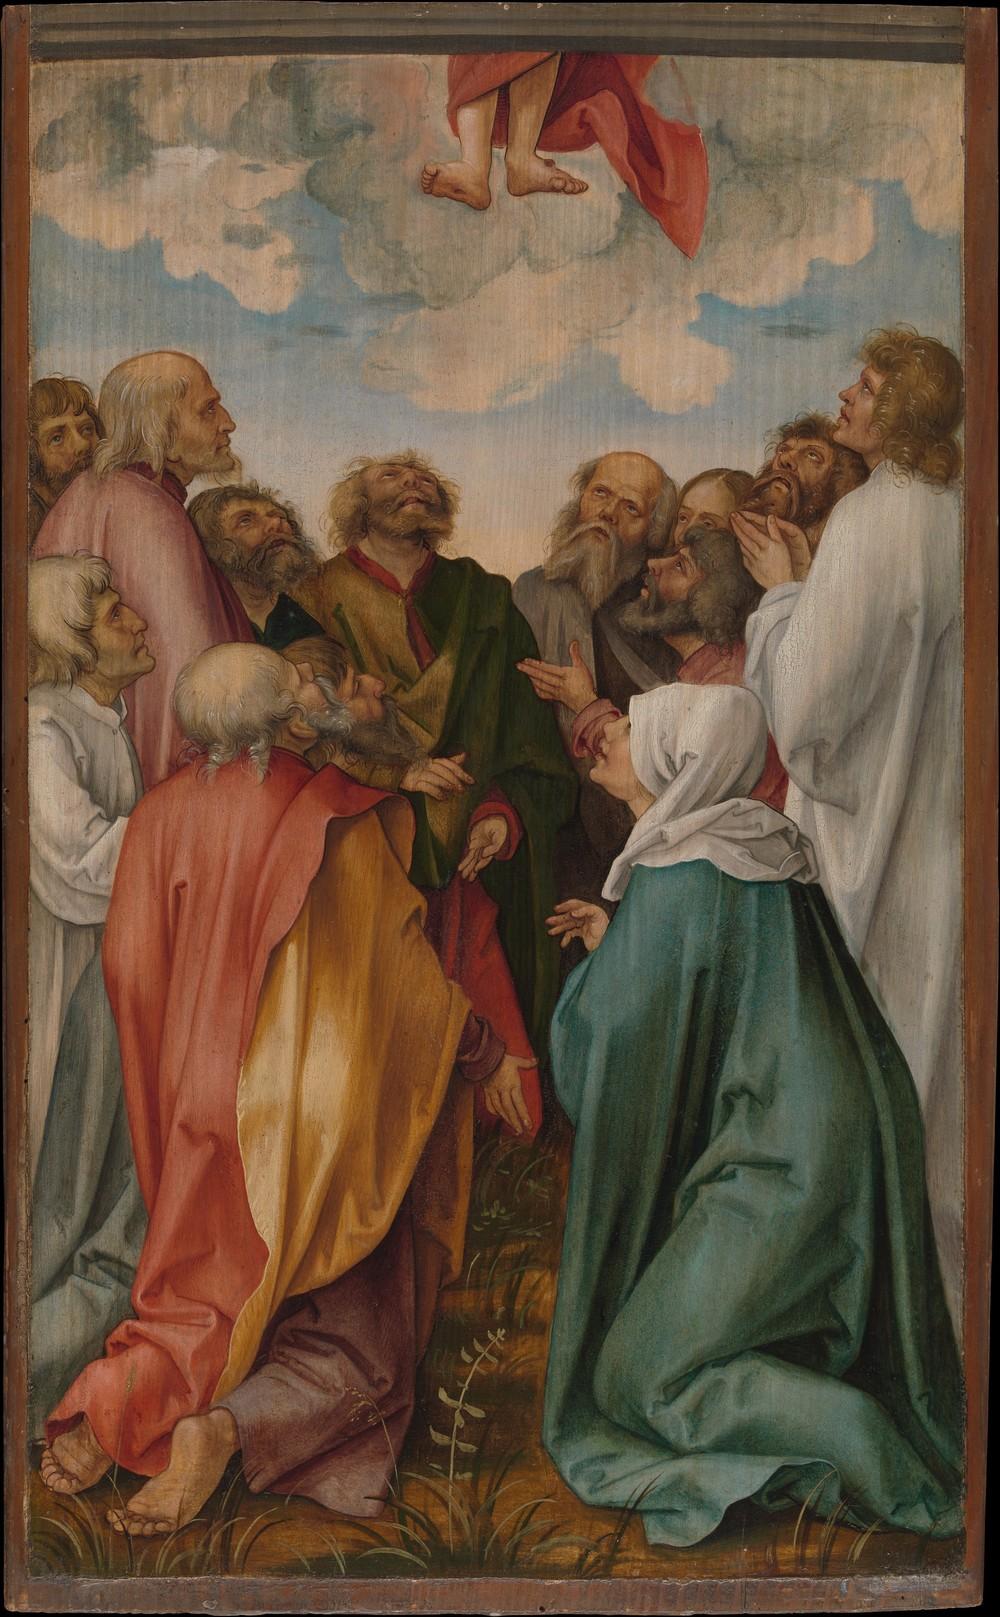 The Ascension of Christ, Hans Süss von Kulmbach, 1513.Metropolitan Museum of Art.